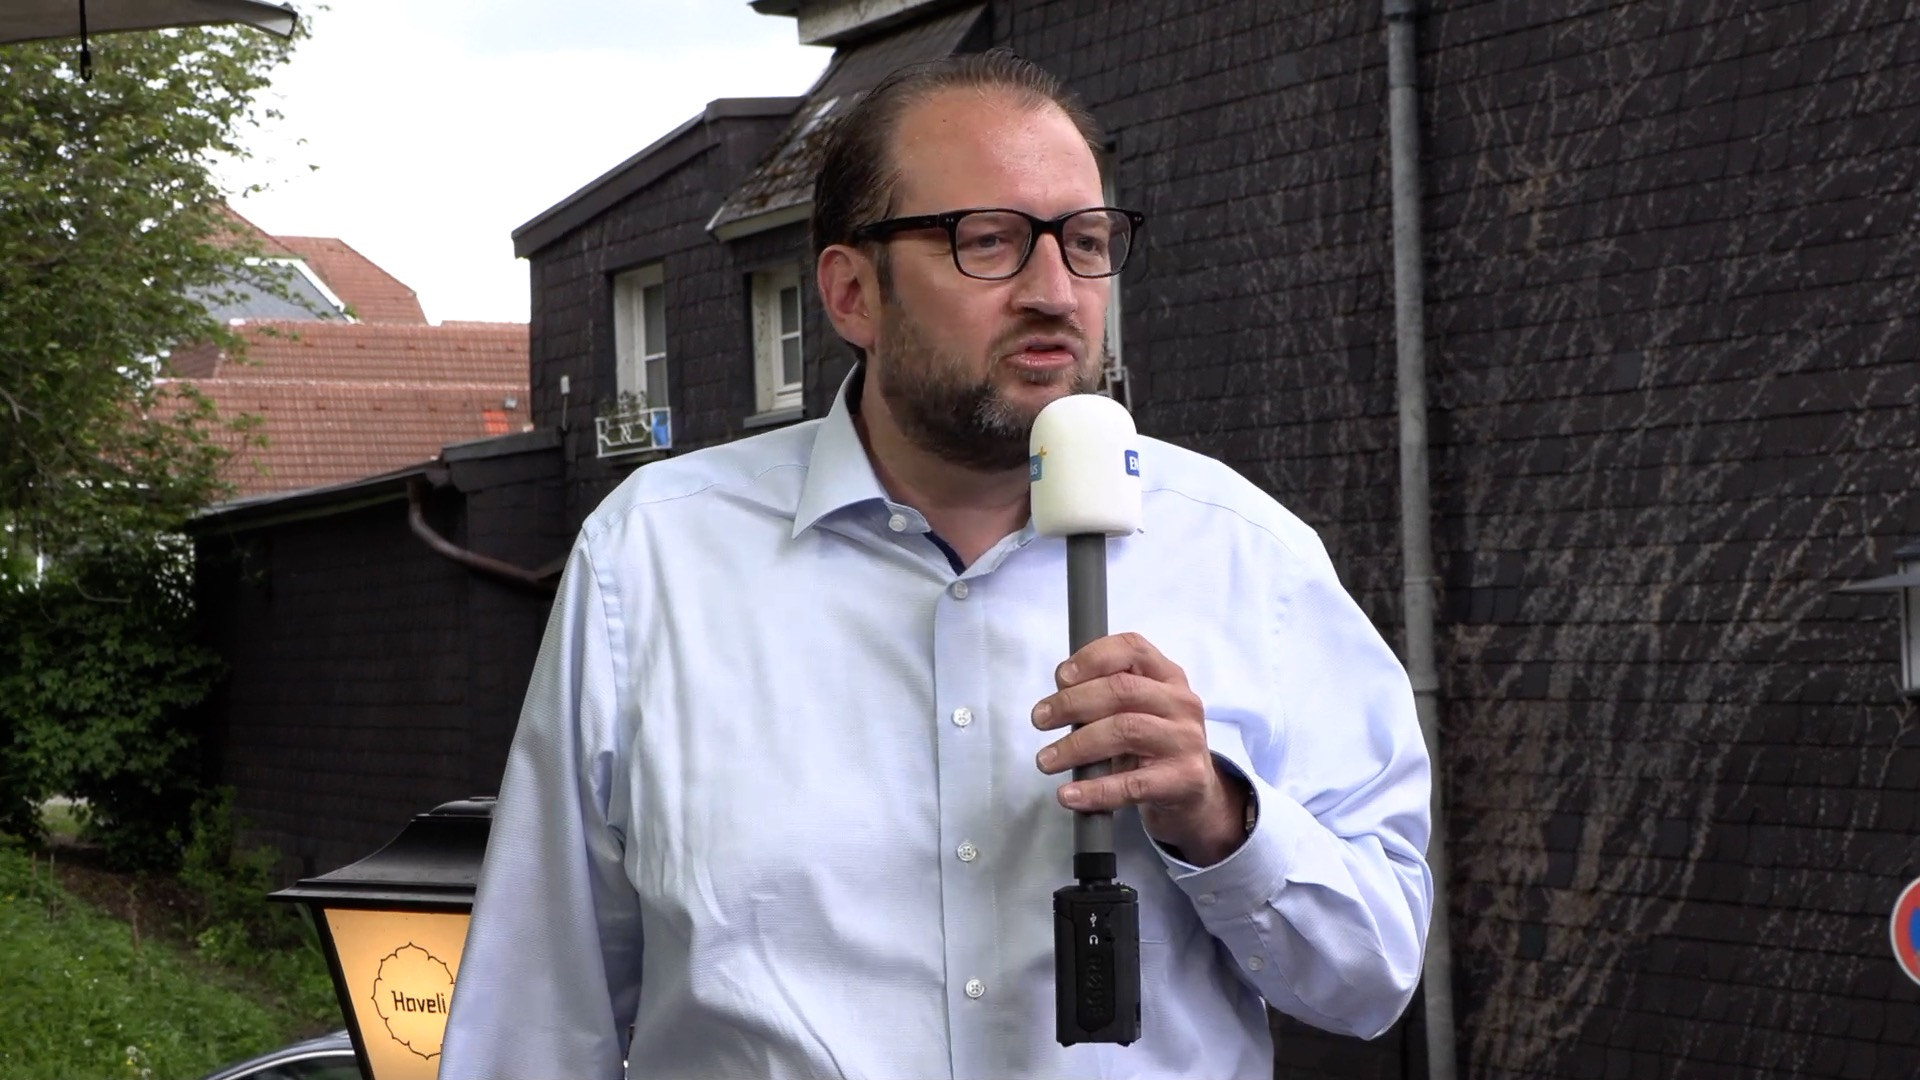 Lars Martin vom Gastro-Verband DEHOGA